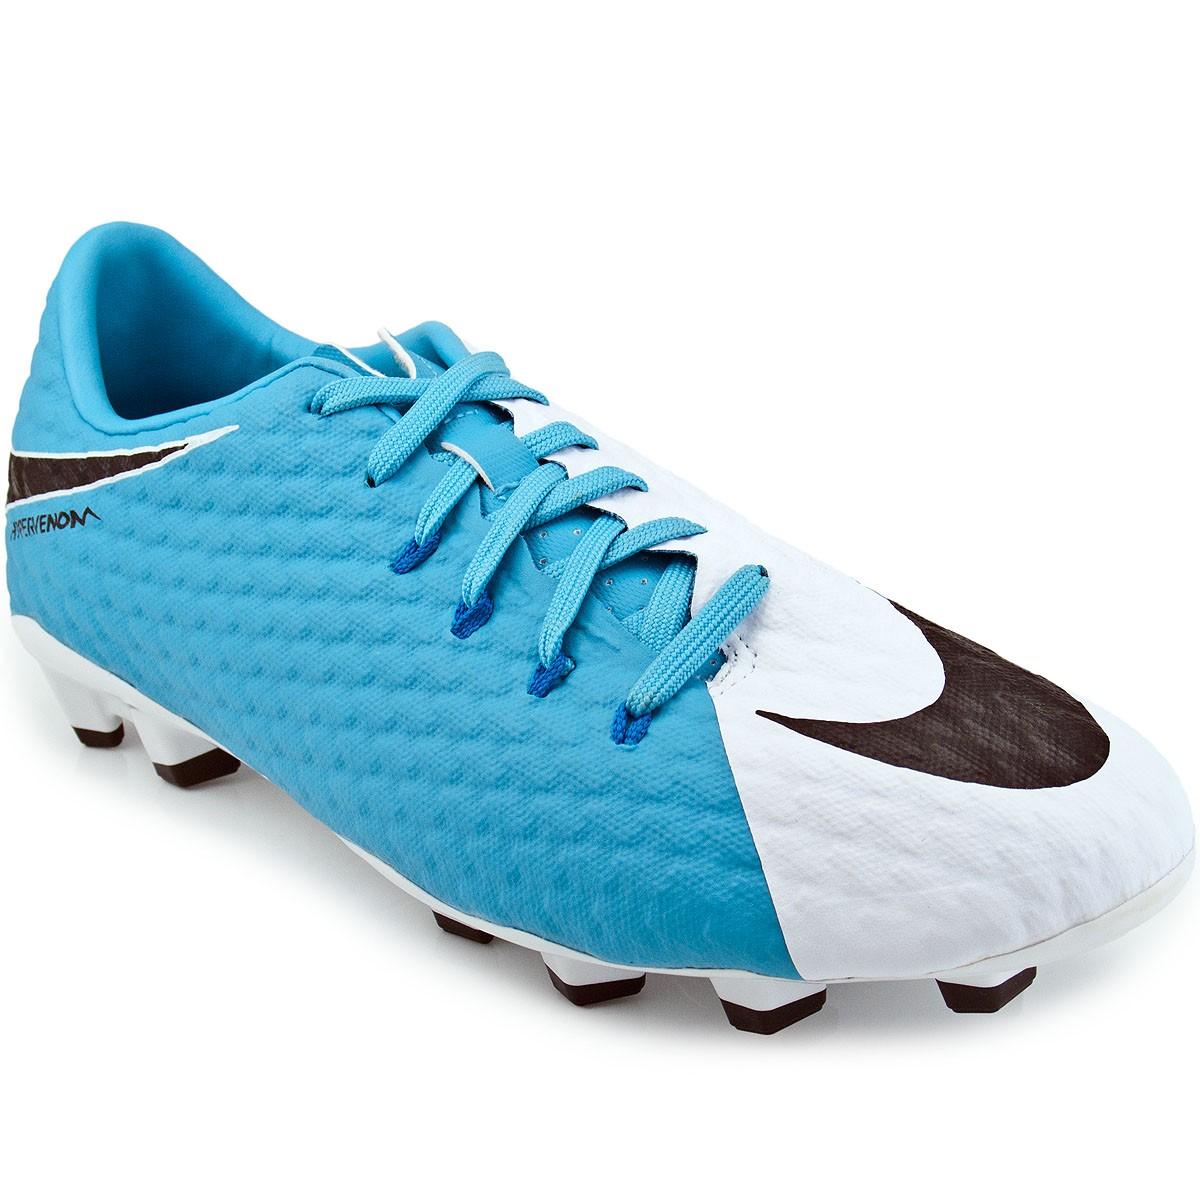 823e6df38fc59 Chuteira Nike Hypervenom Phelon III FG | Futebol | MaxTennis